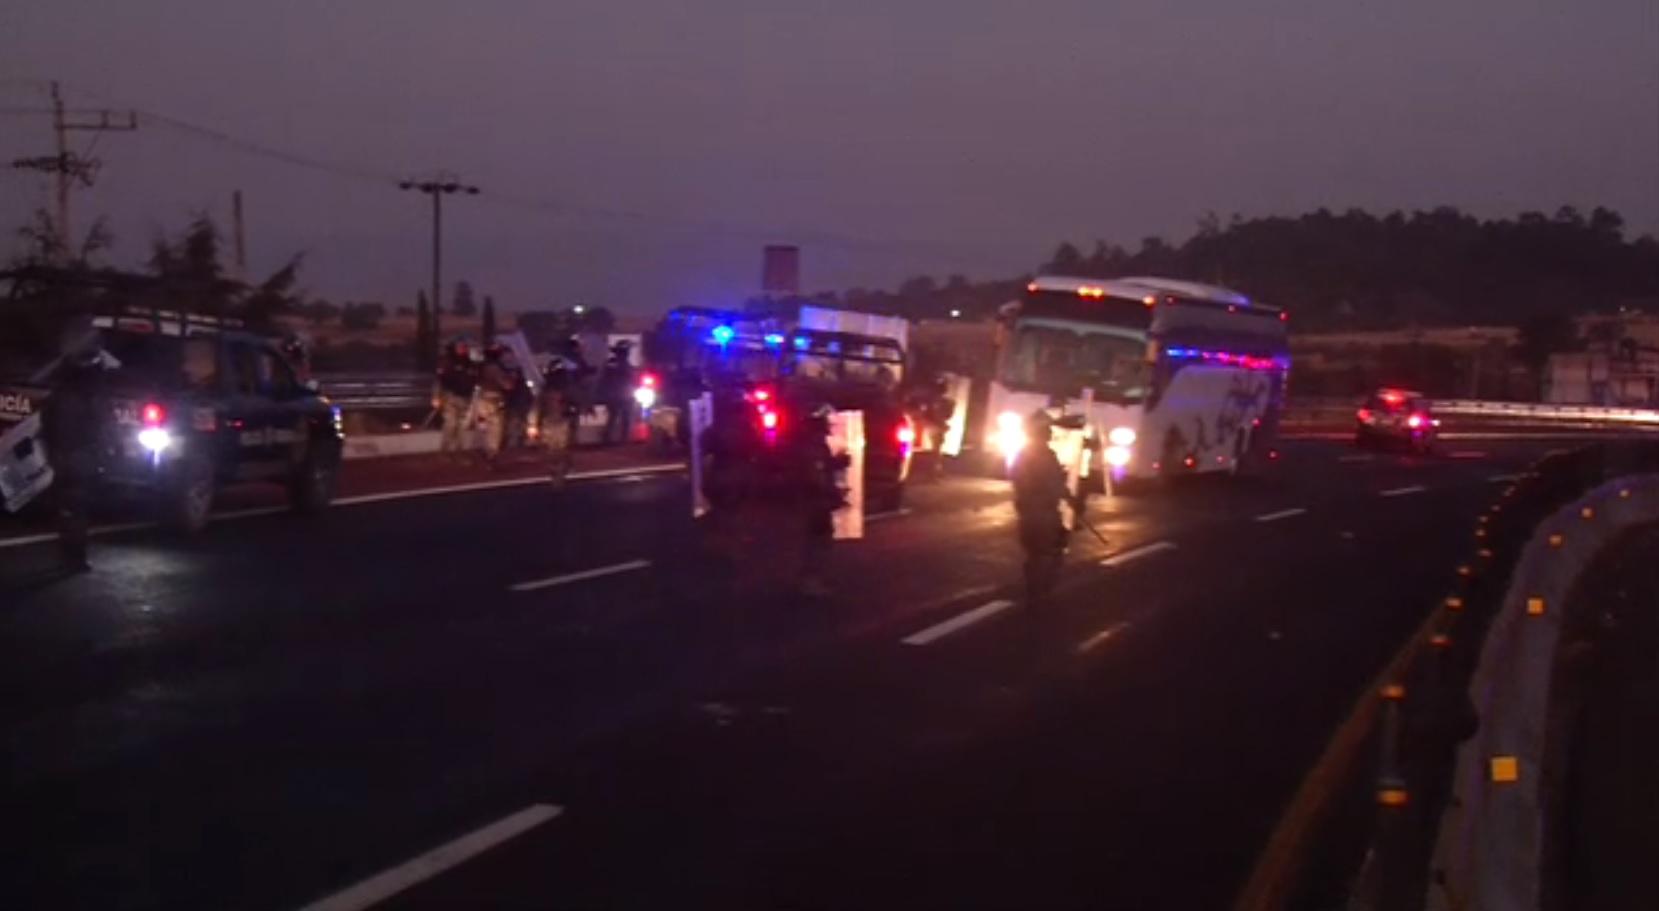 reabren autopista mexico puebla tras bloqueo